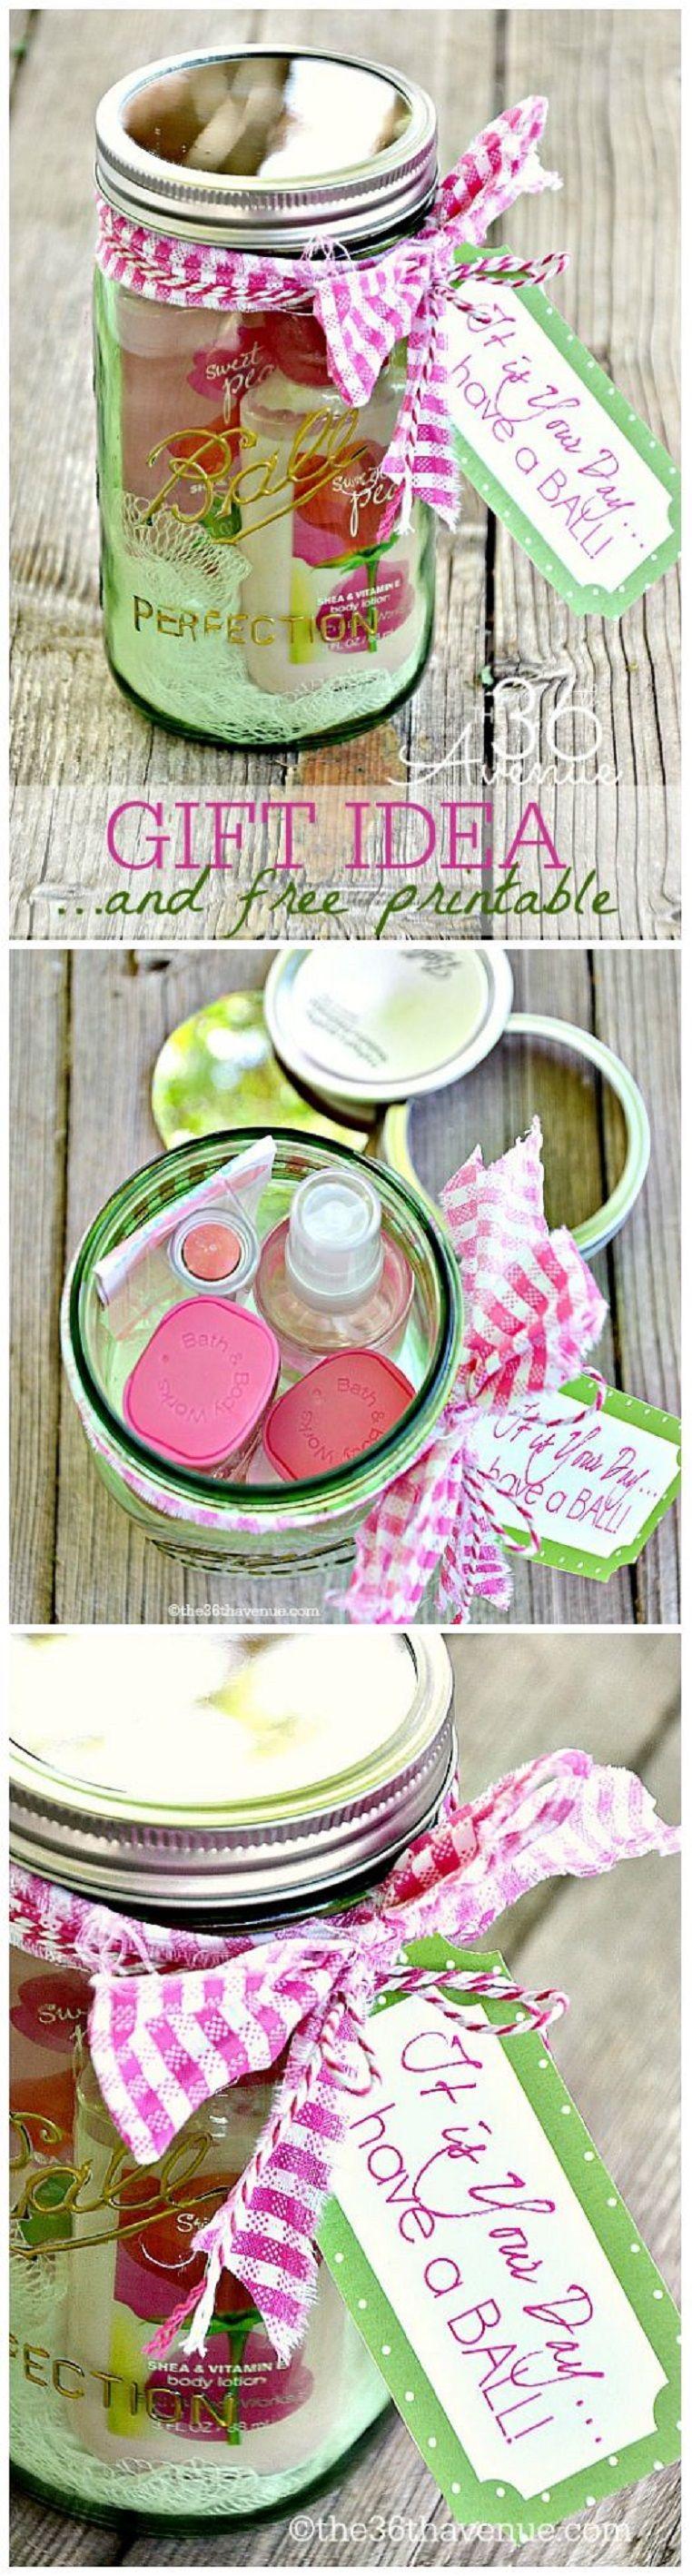 10 Adorable Mason Jar Crafts - GleamItUp